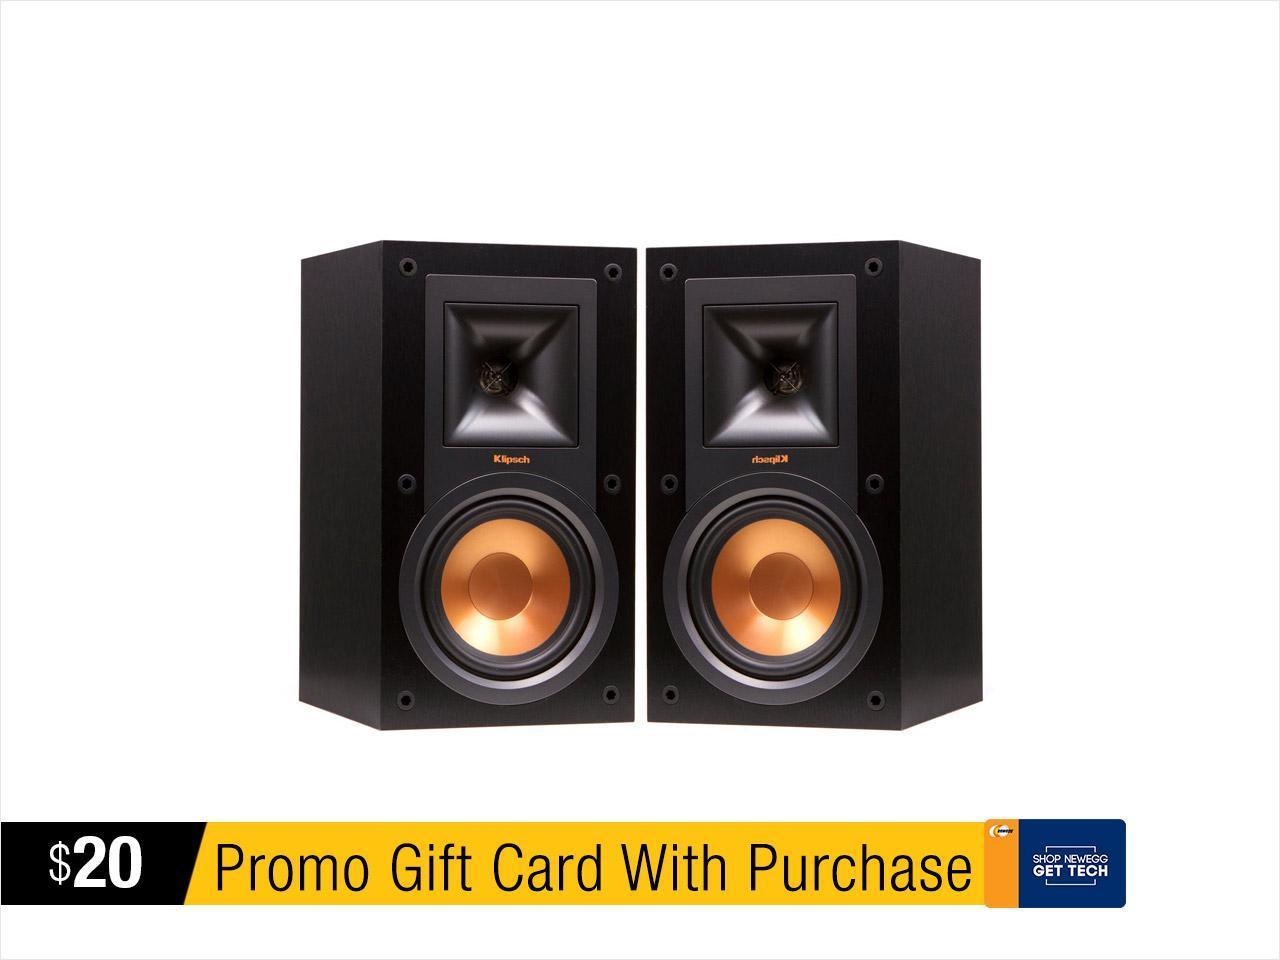 (pair) Klipsch R-15M Bookshelf Monitor Speakers + $20 Newegg E-Gift Card $124 + free s/h